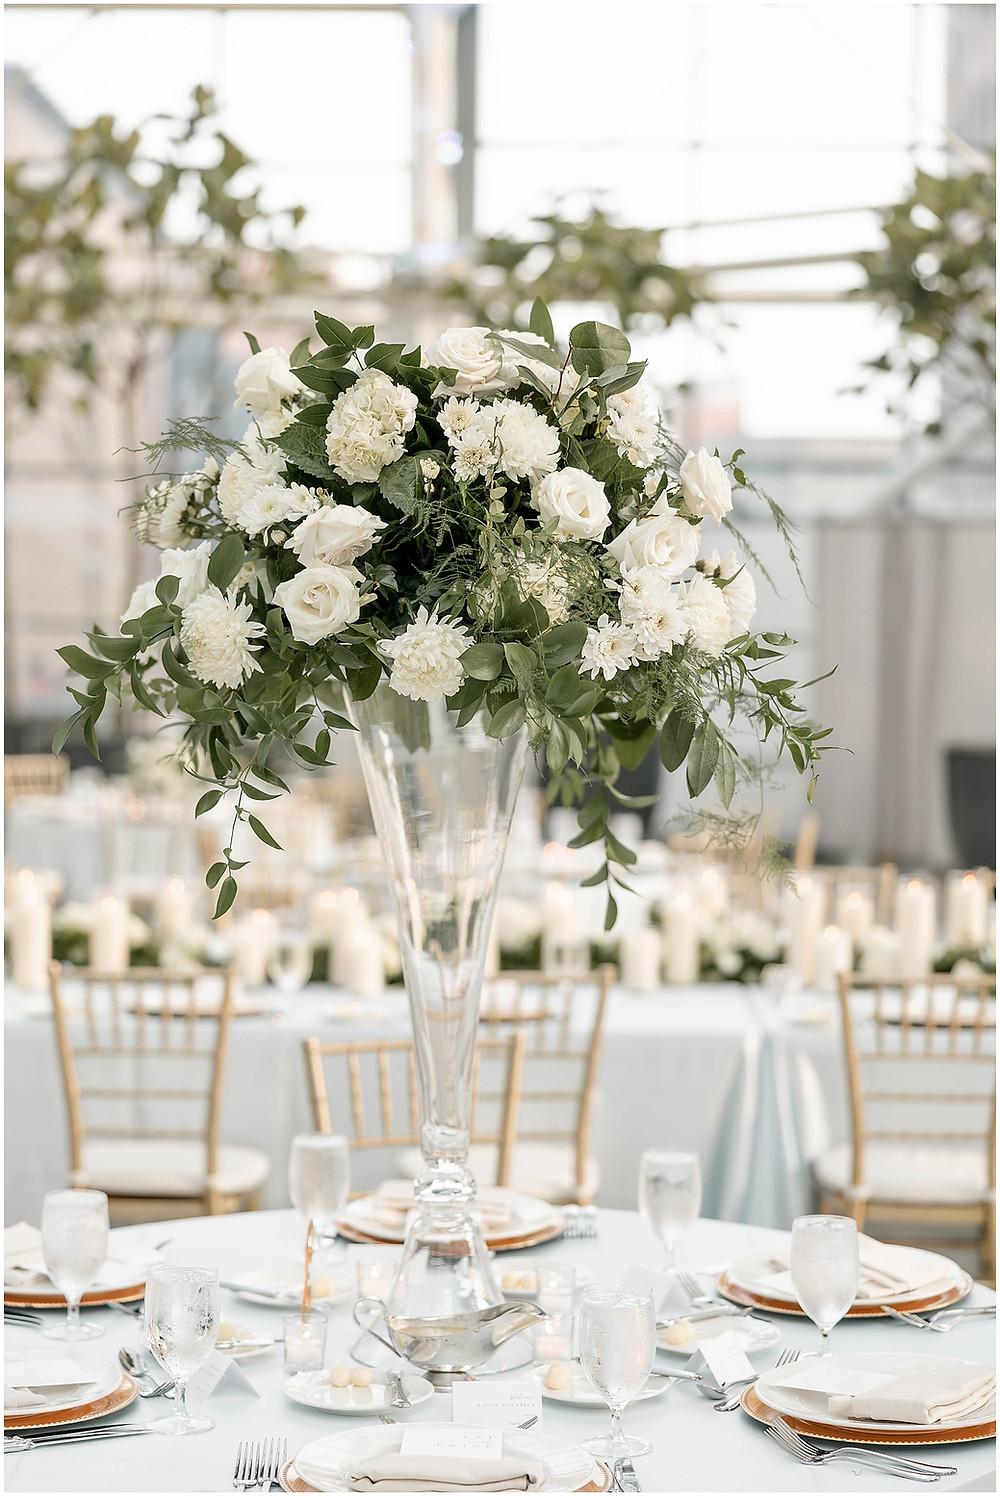 Artsgarden-wedding-reception-photos-indianapolis